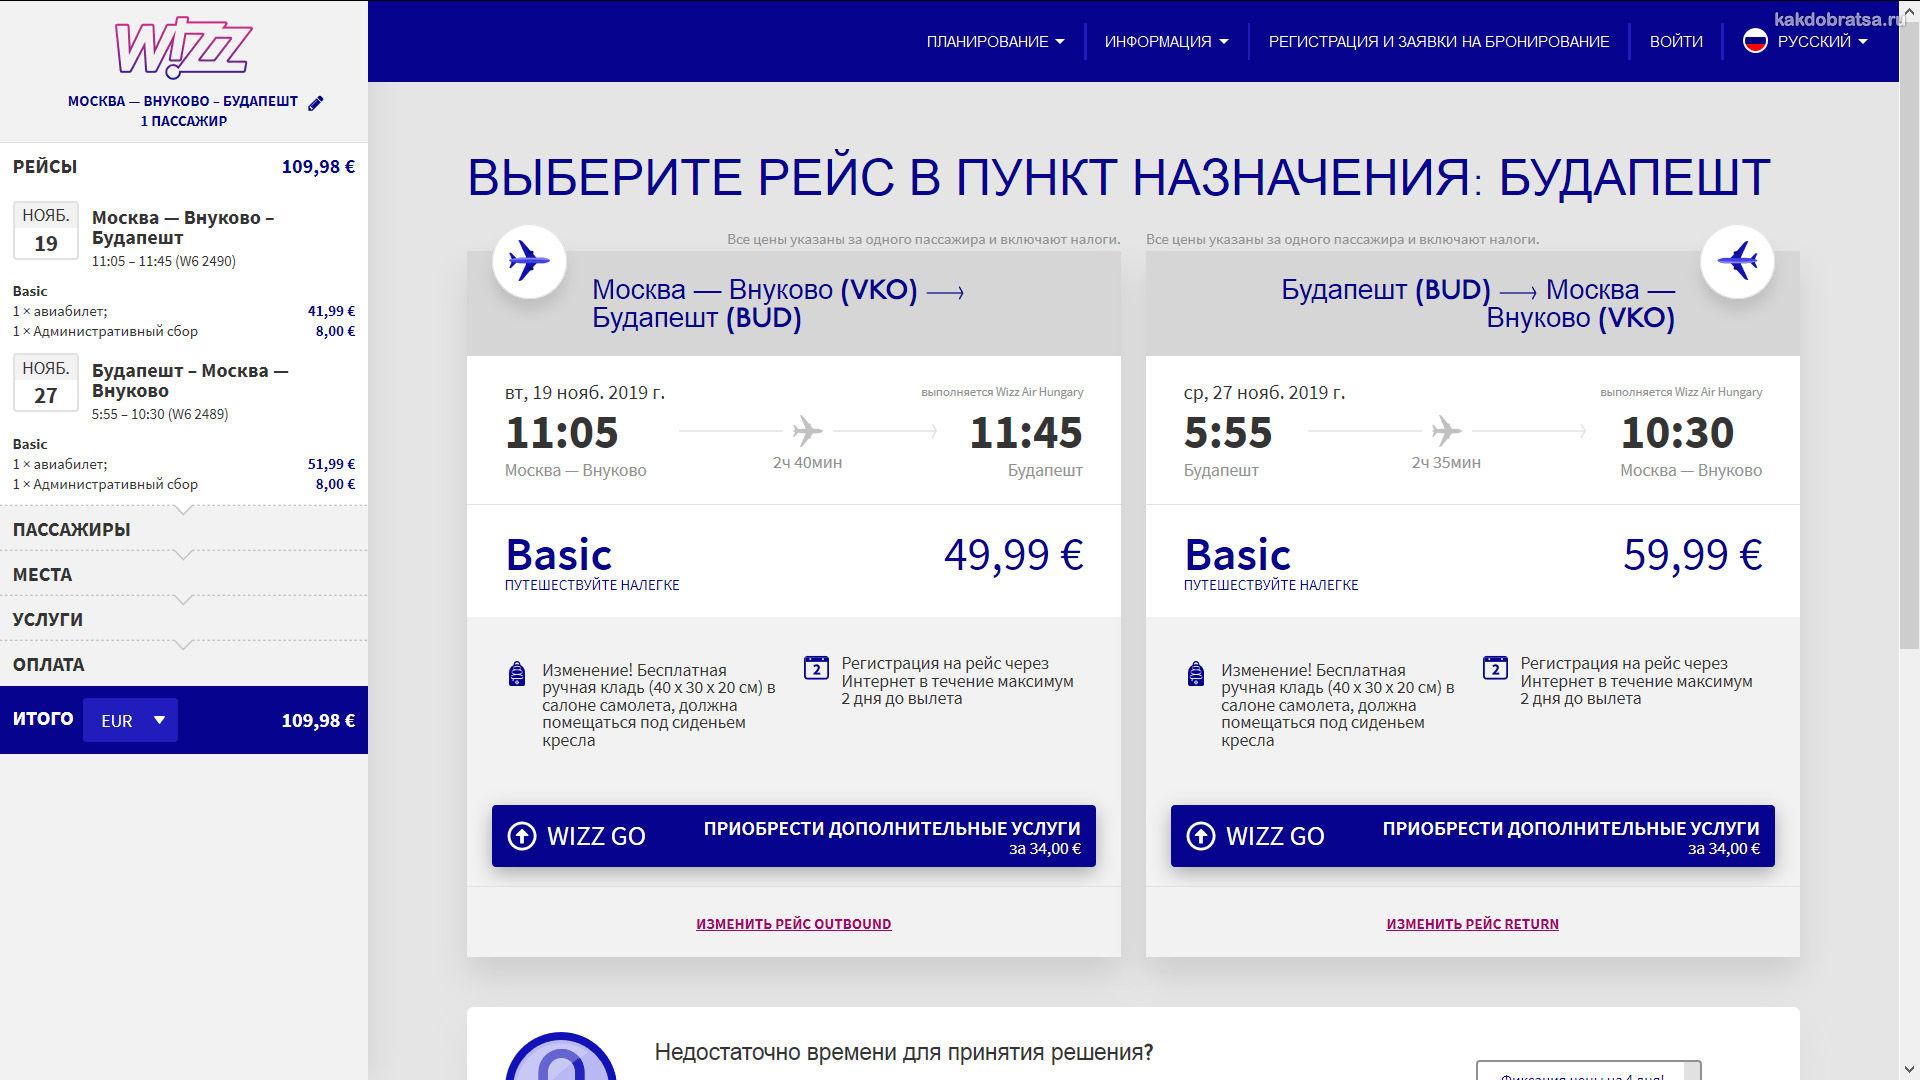 Покупка билета на Wizz Air из Москвы в Будапешт шаг 4